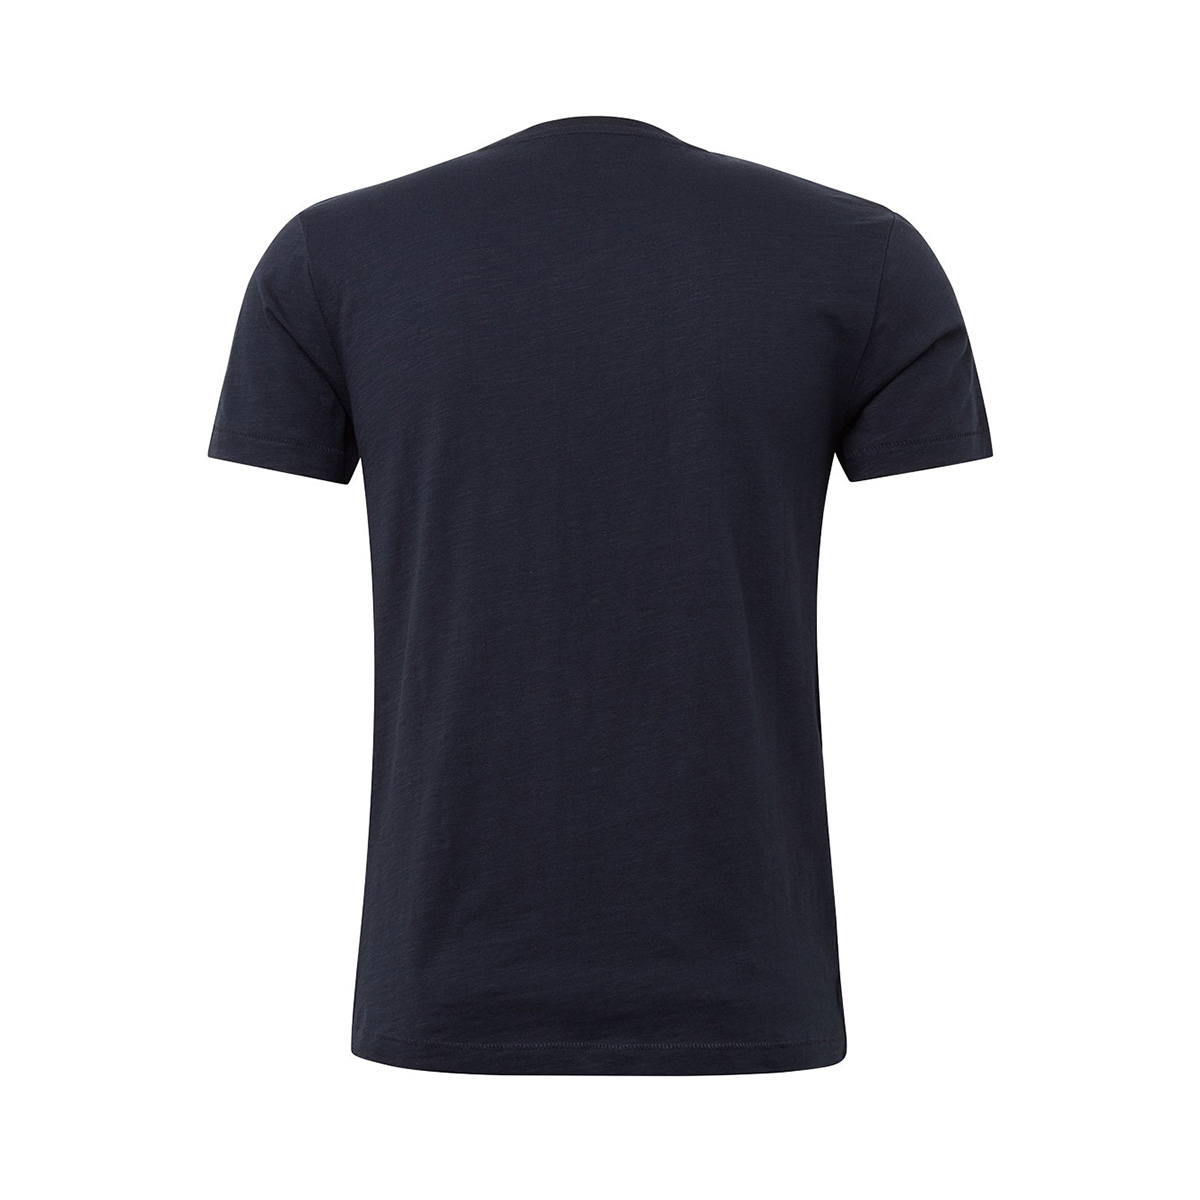 1008175xx12 tom tailor t-shirt 10668